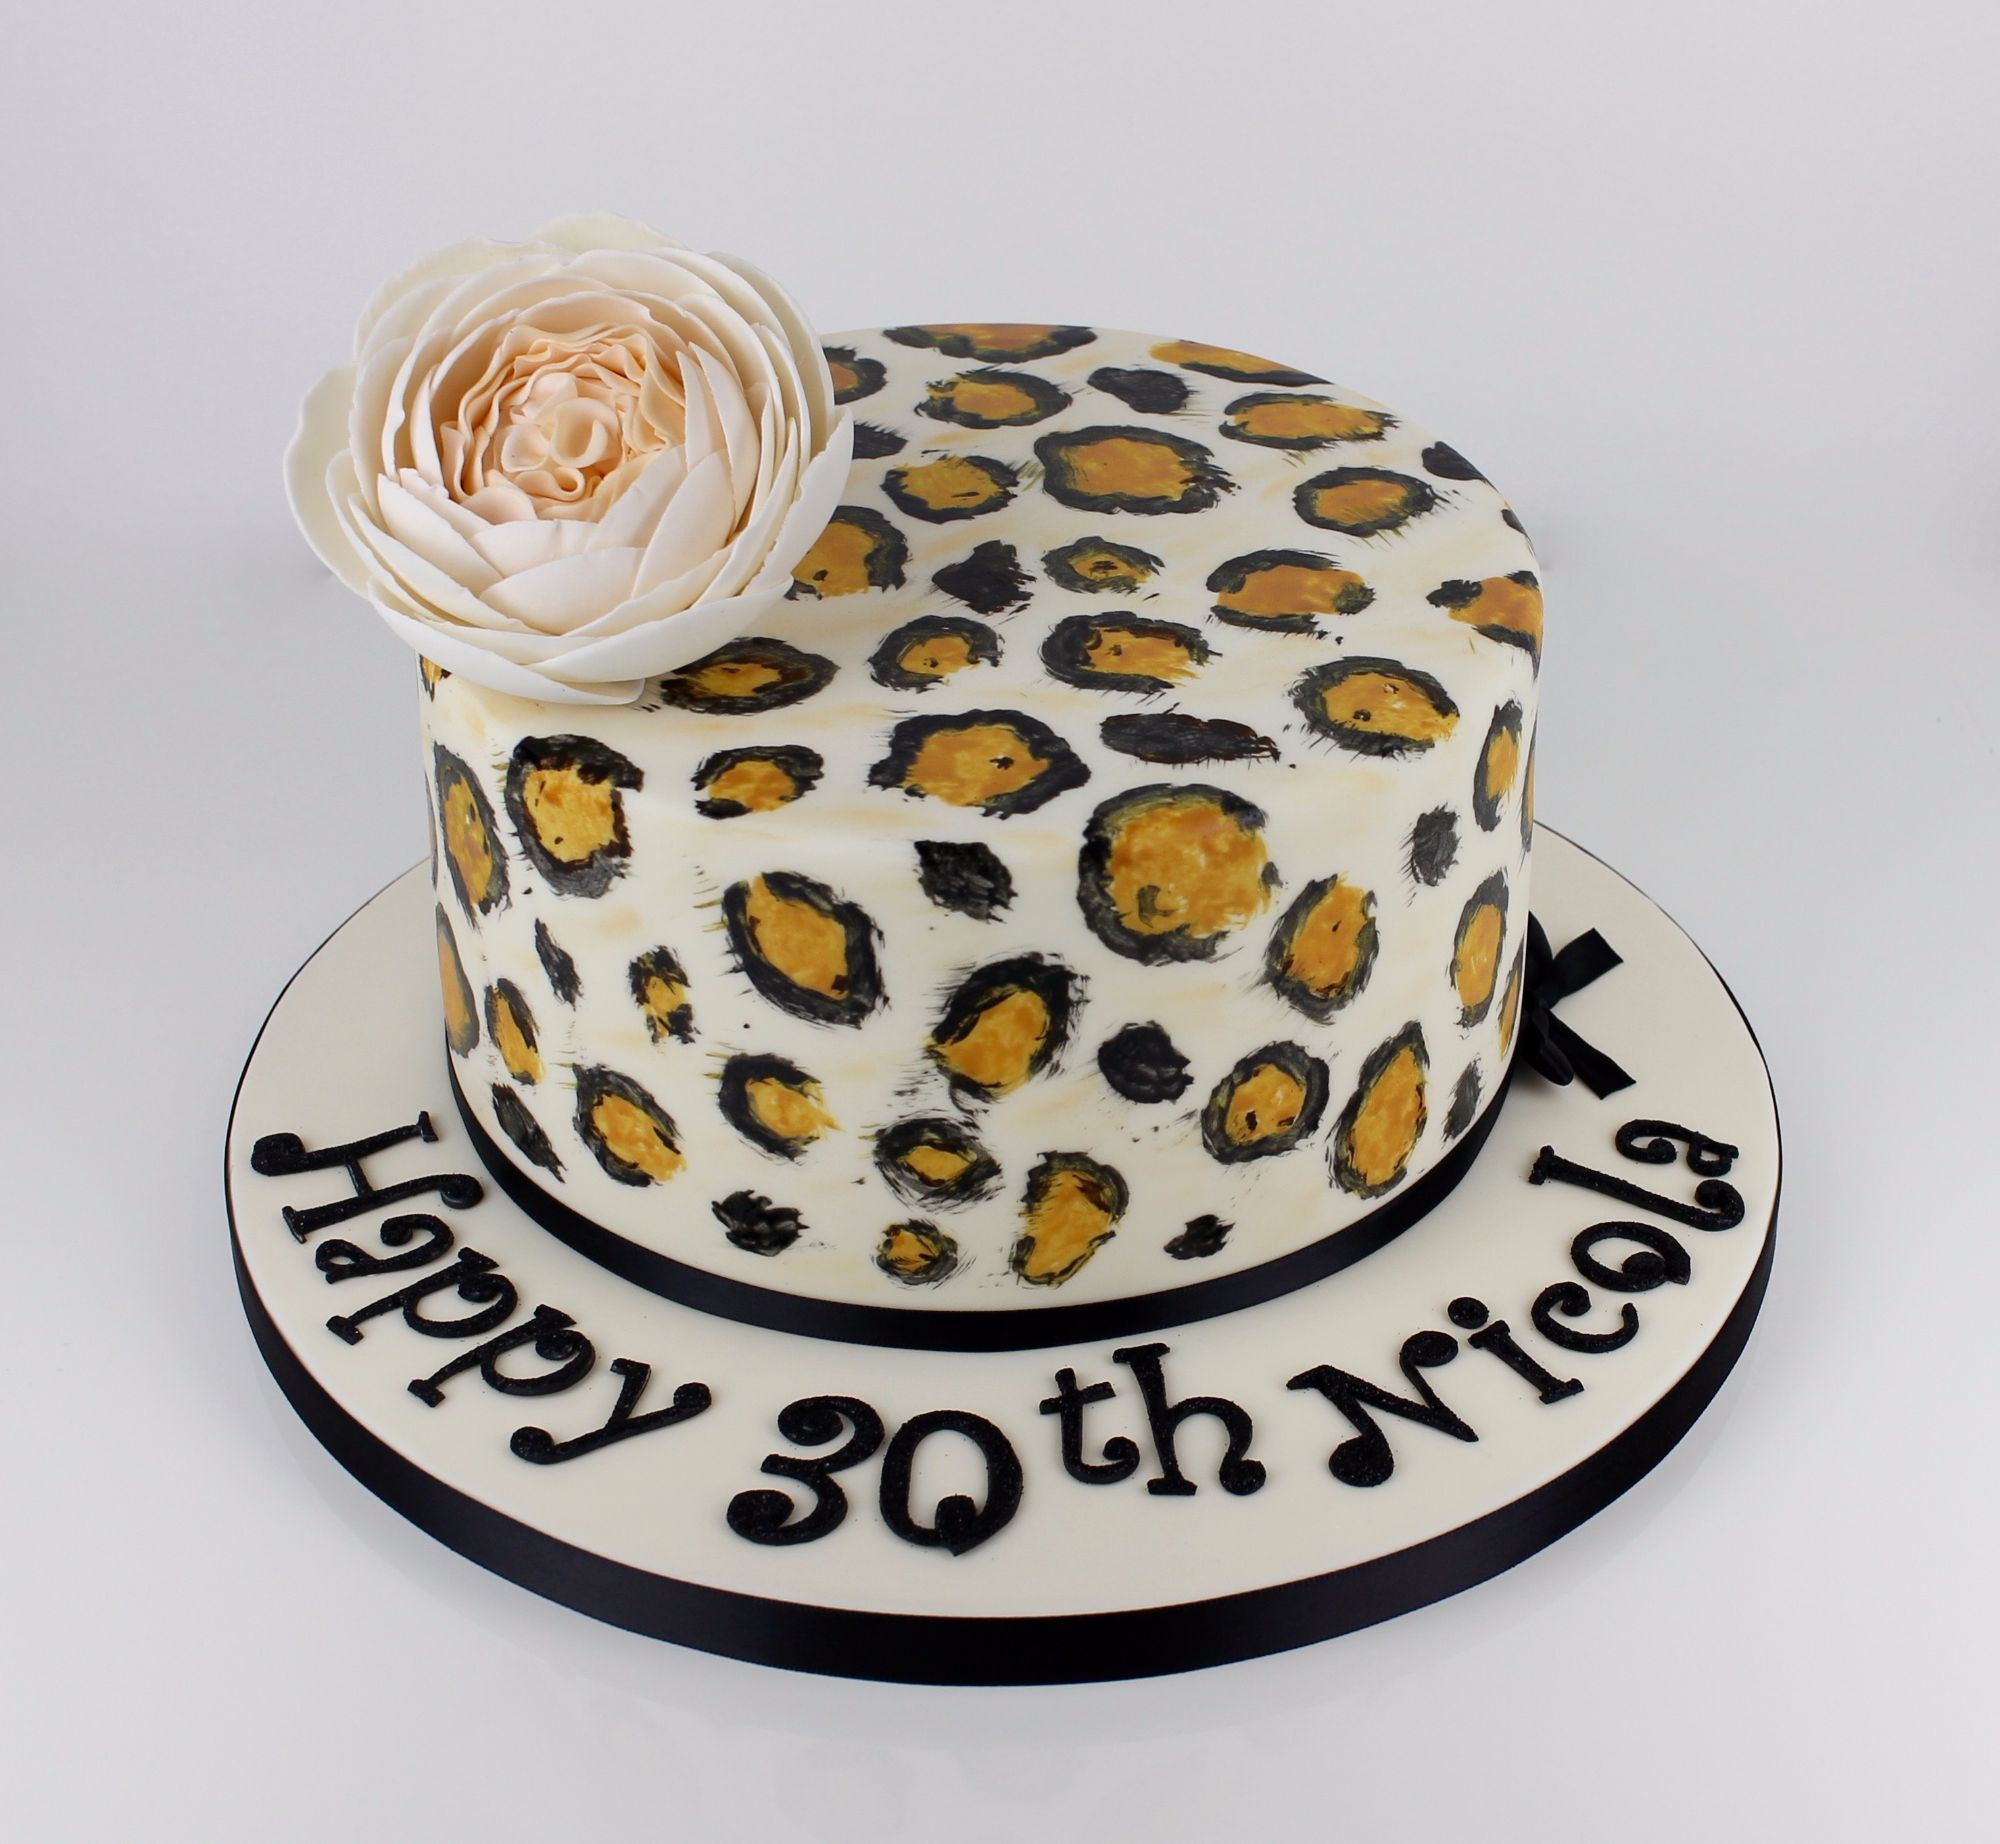 Classy leopard print design.